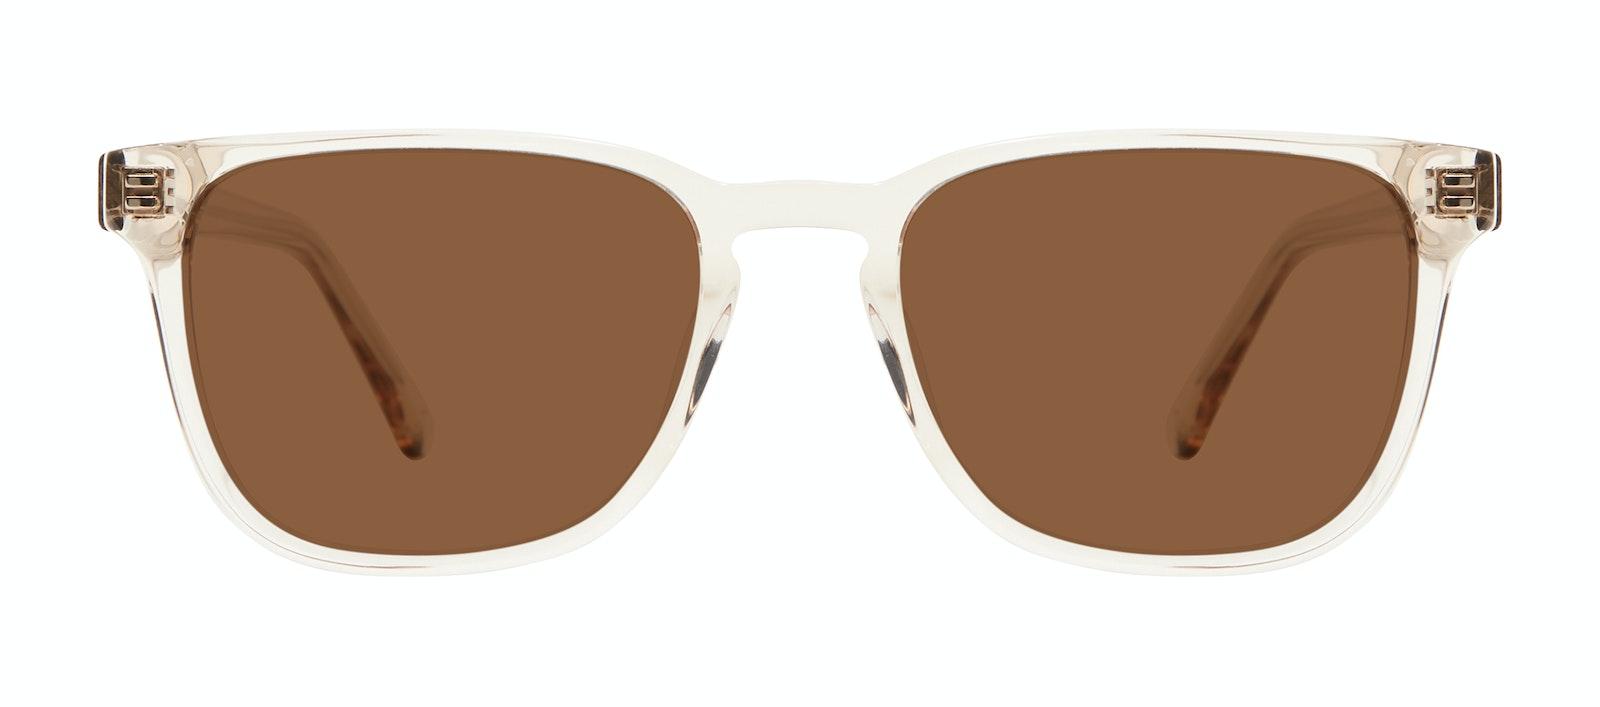 Affordable Fashion Glasses Square Sunglasses Men Kim Clay Front